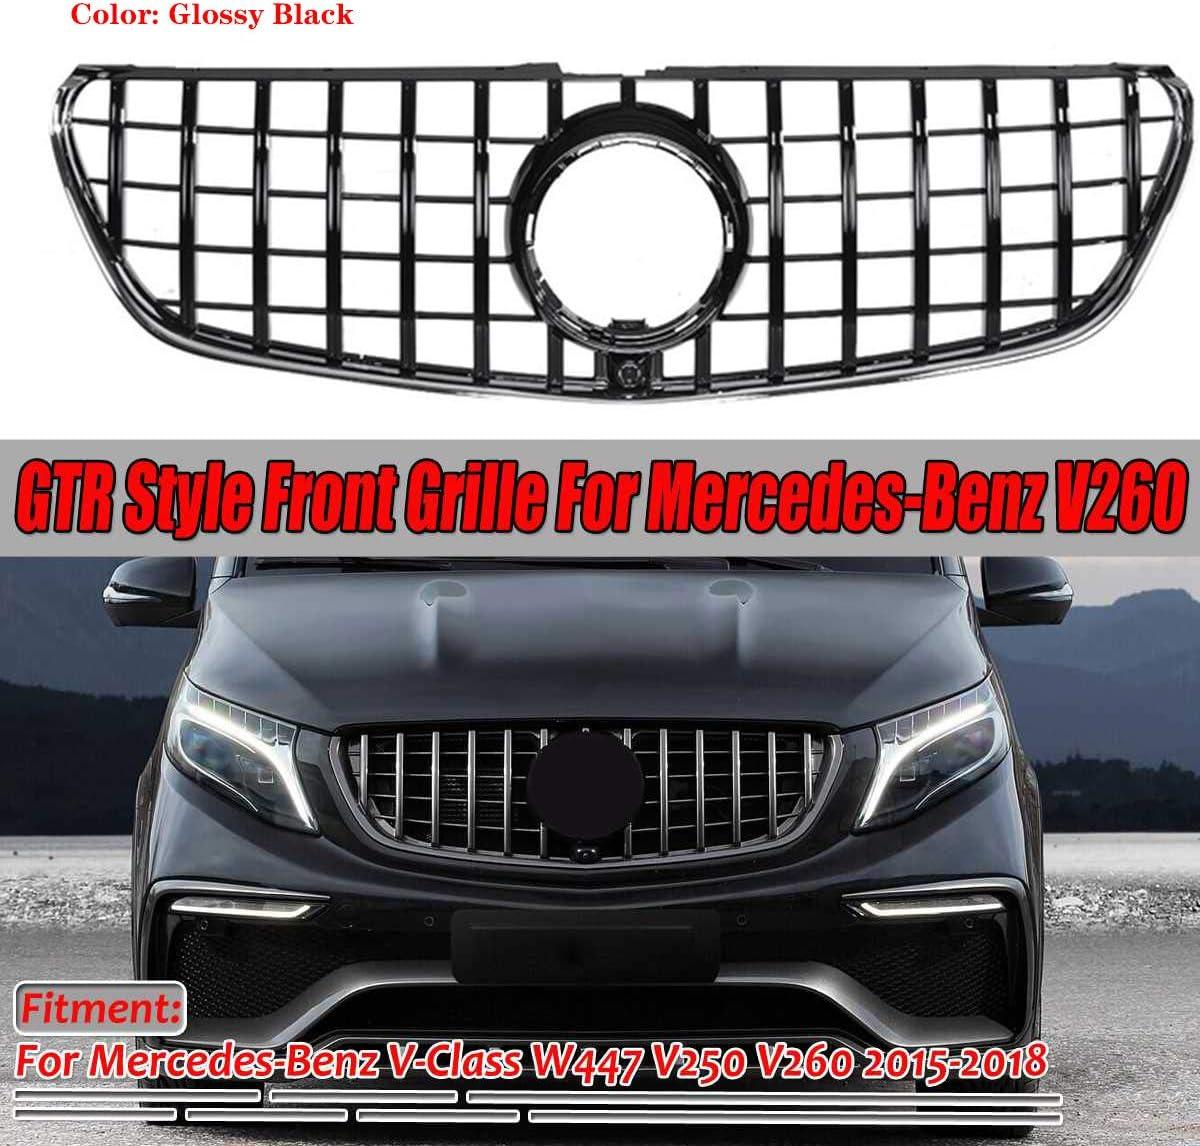 Lsybb Gtr Style Kühlergrill Auto Frontstoßstange Gt Grill Für Mercedes Benz V Klasse W447 V250 V260 2015 2018 Black Auto